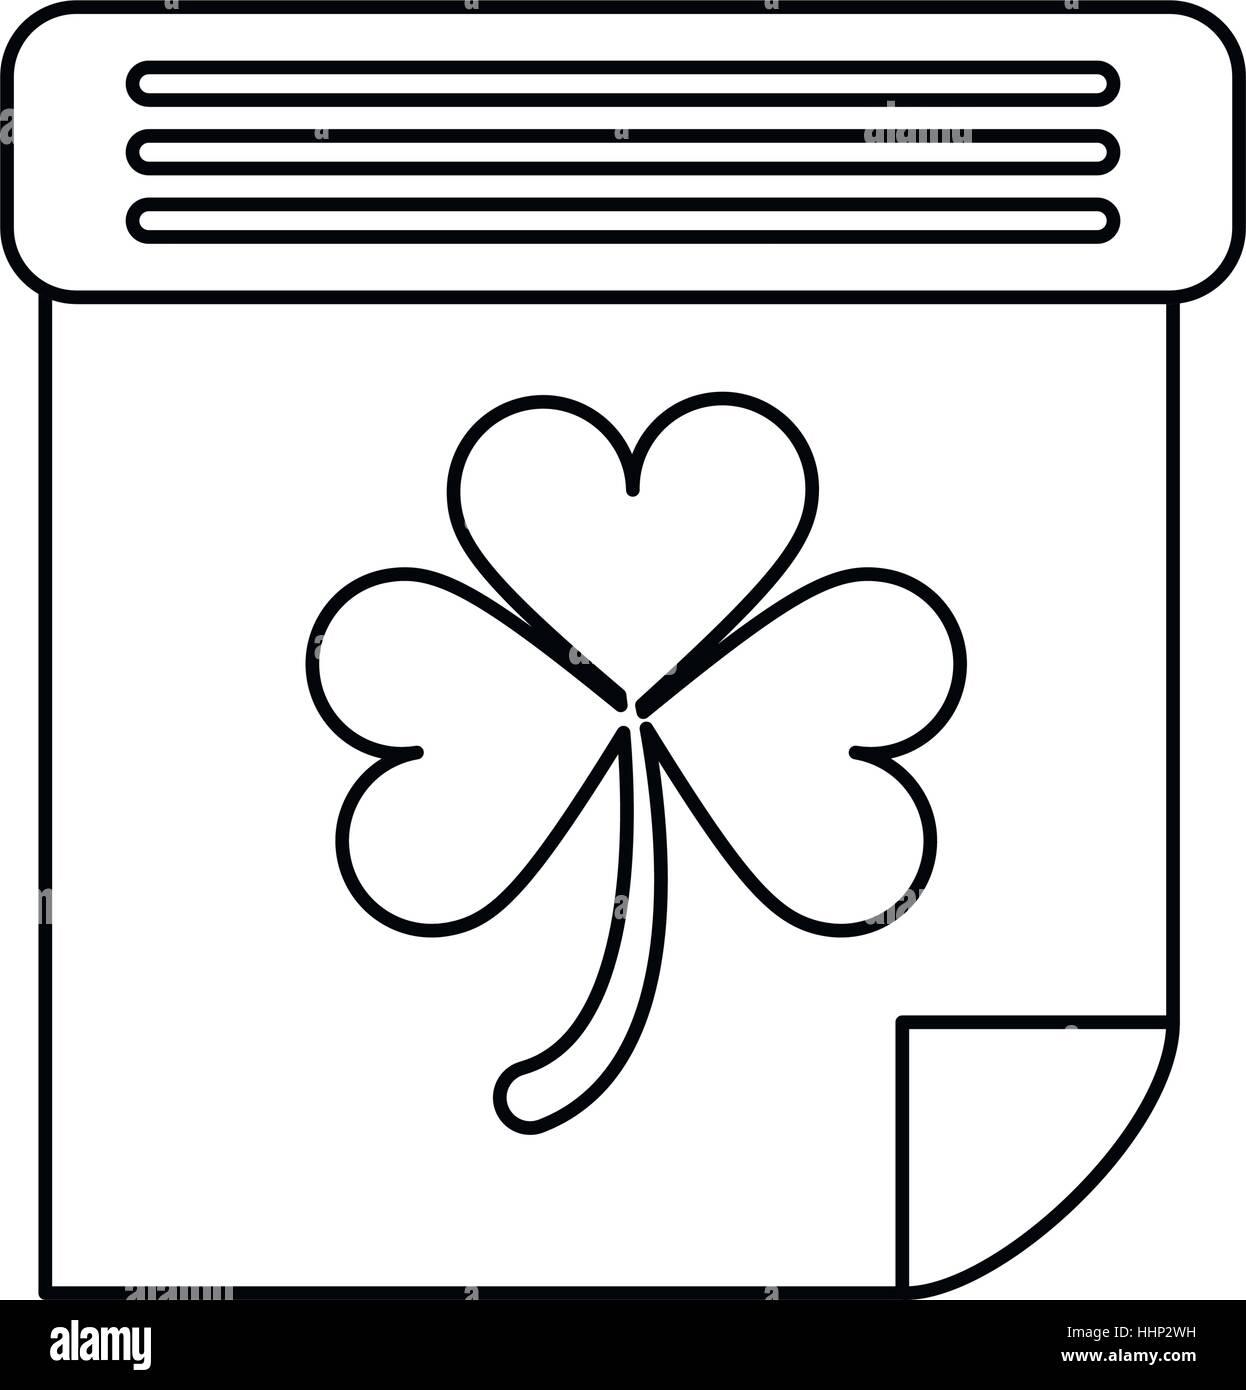 calendar clover st patrick day irish culture outline - Stock Image